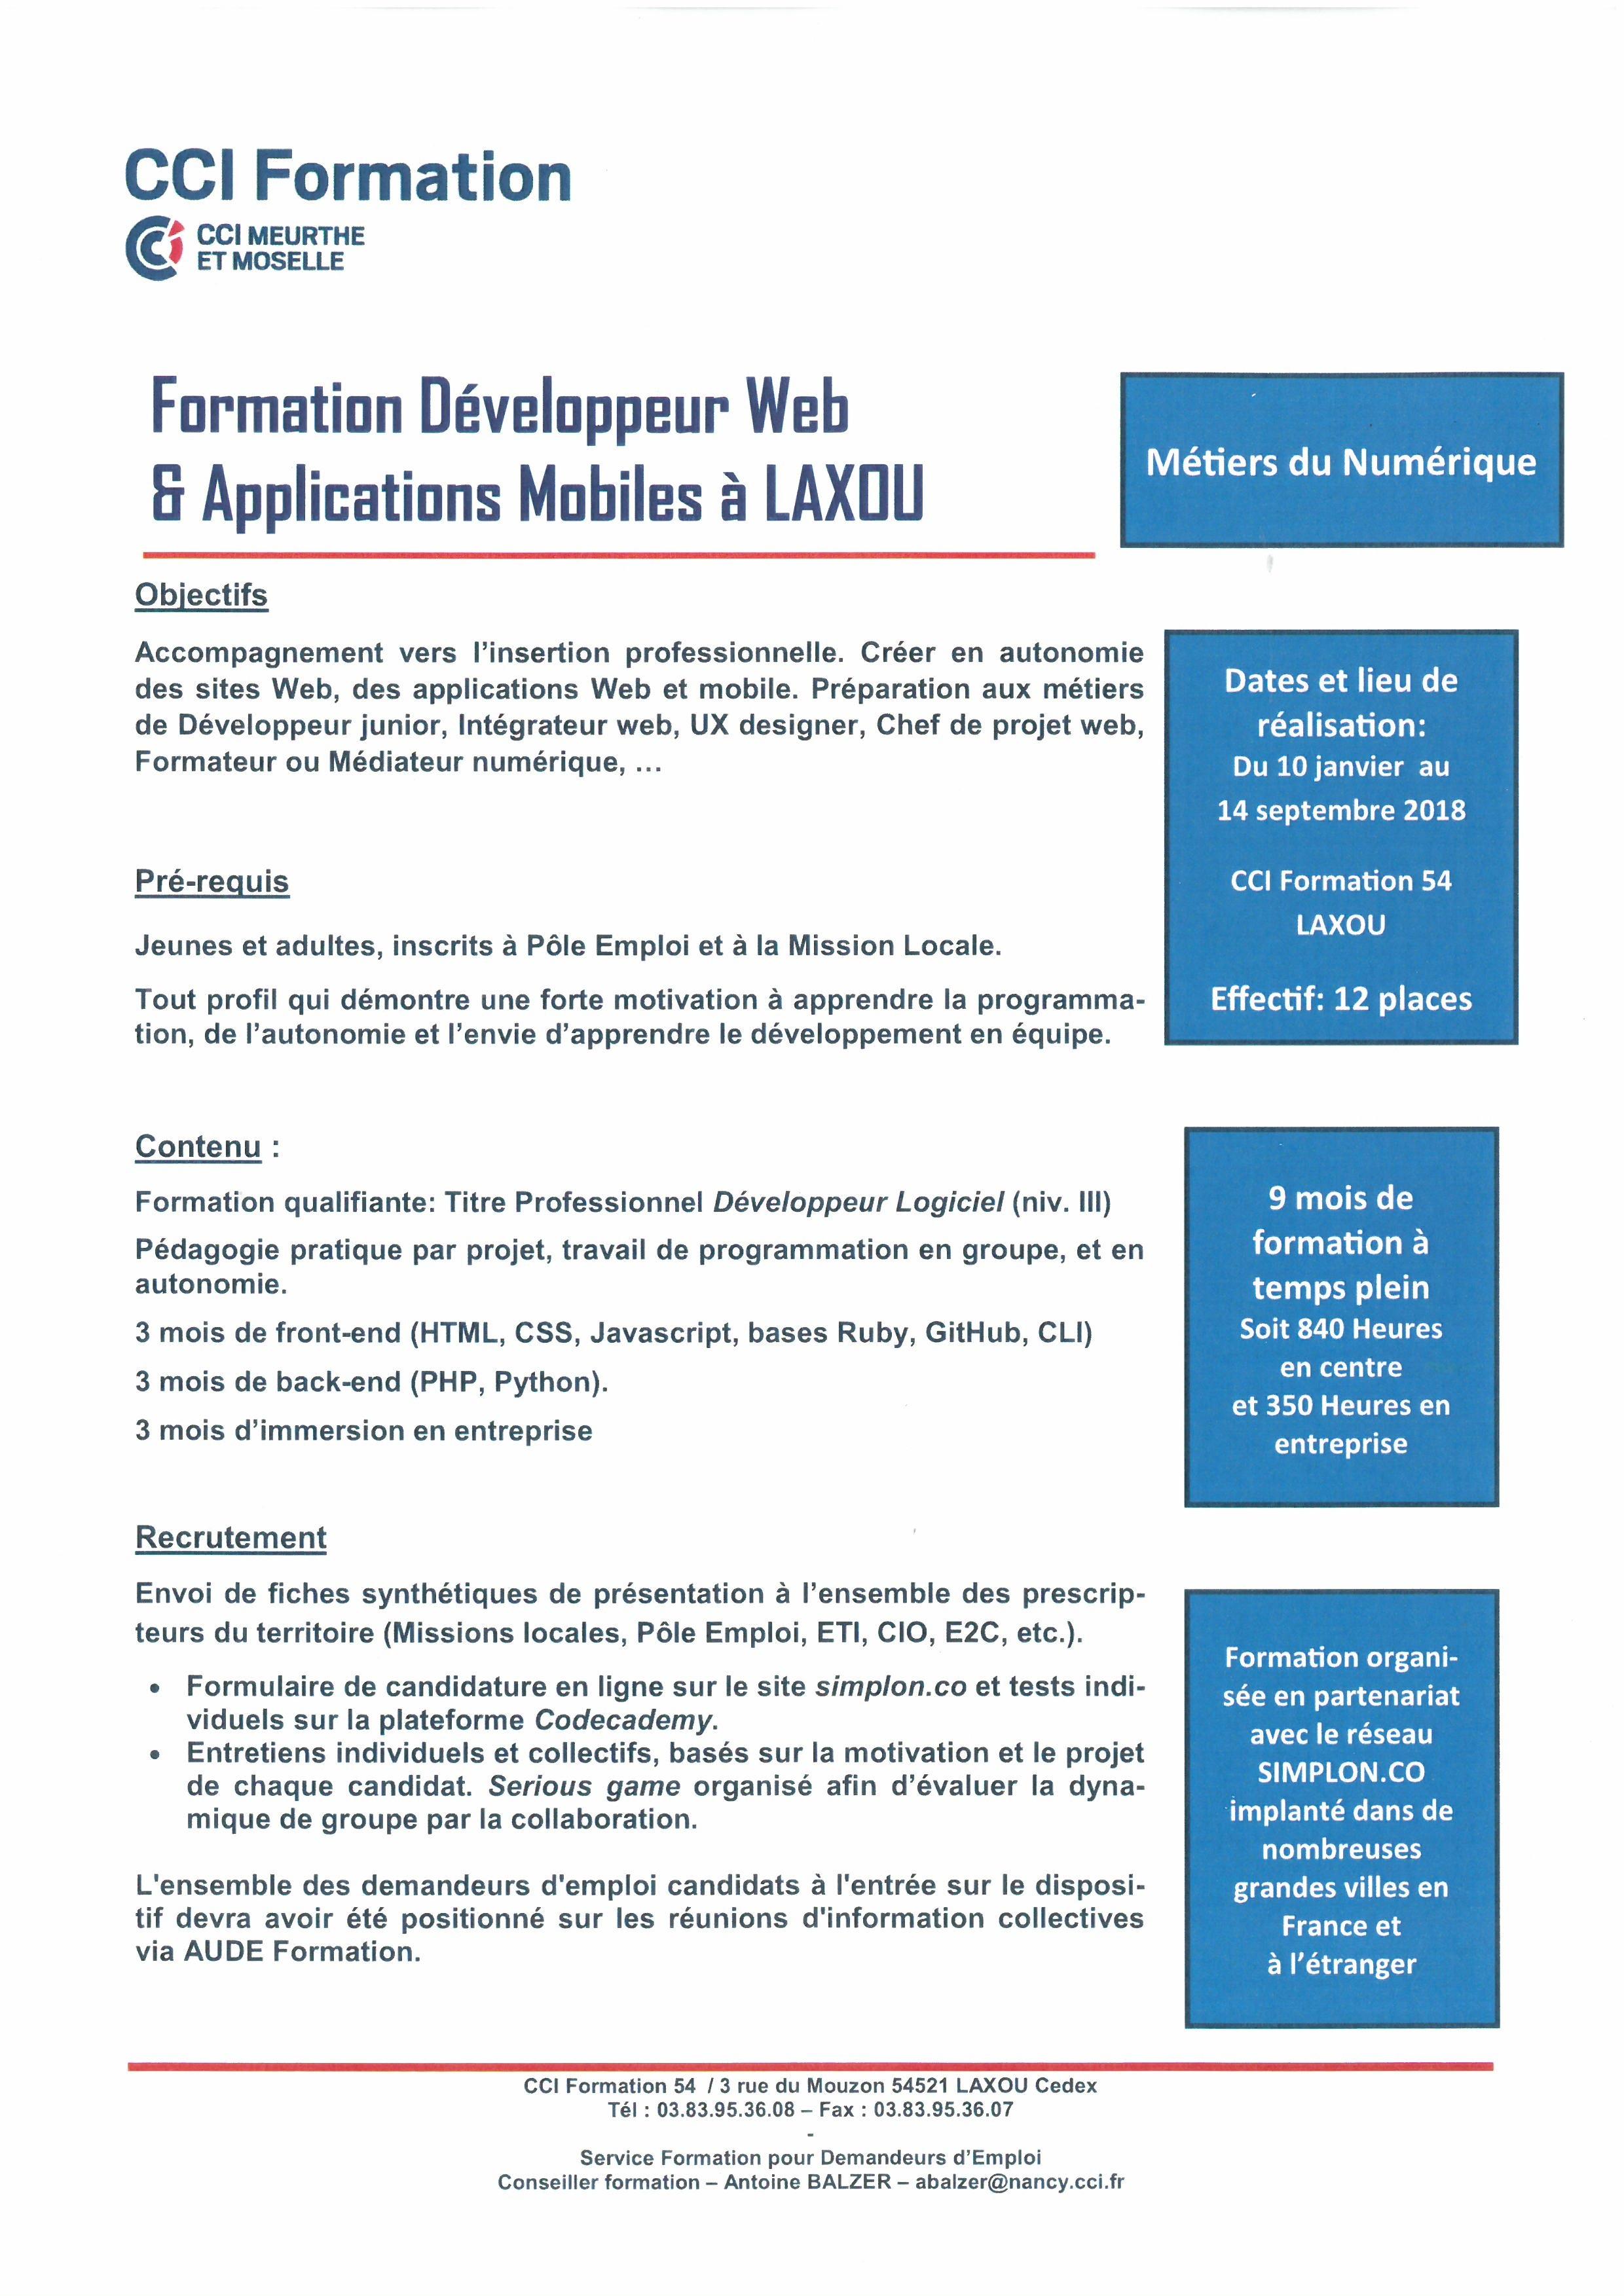 FORMATION DÉVELOPPEUR WEB & APPLICATIONS MOBILES